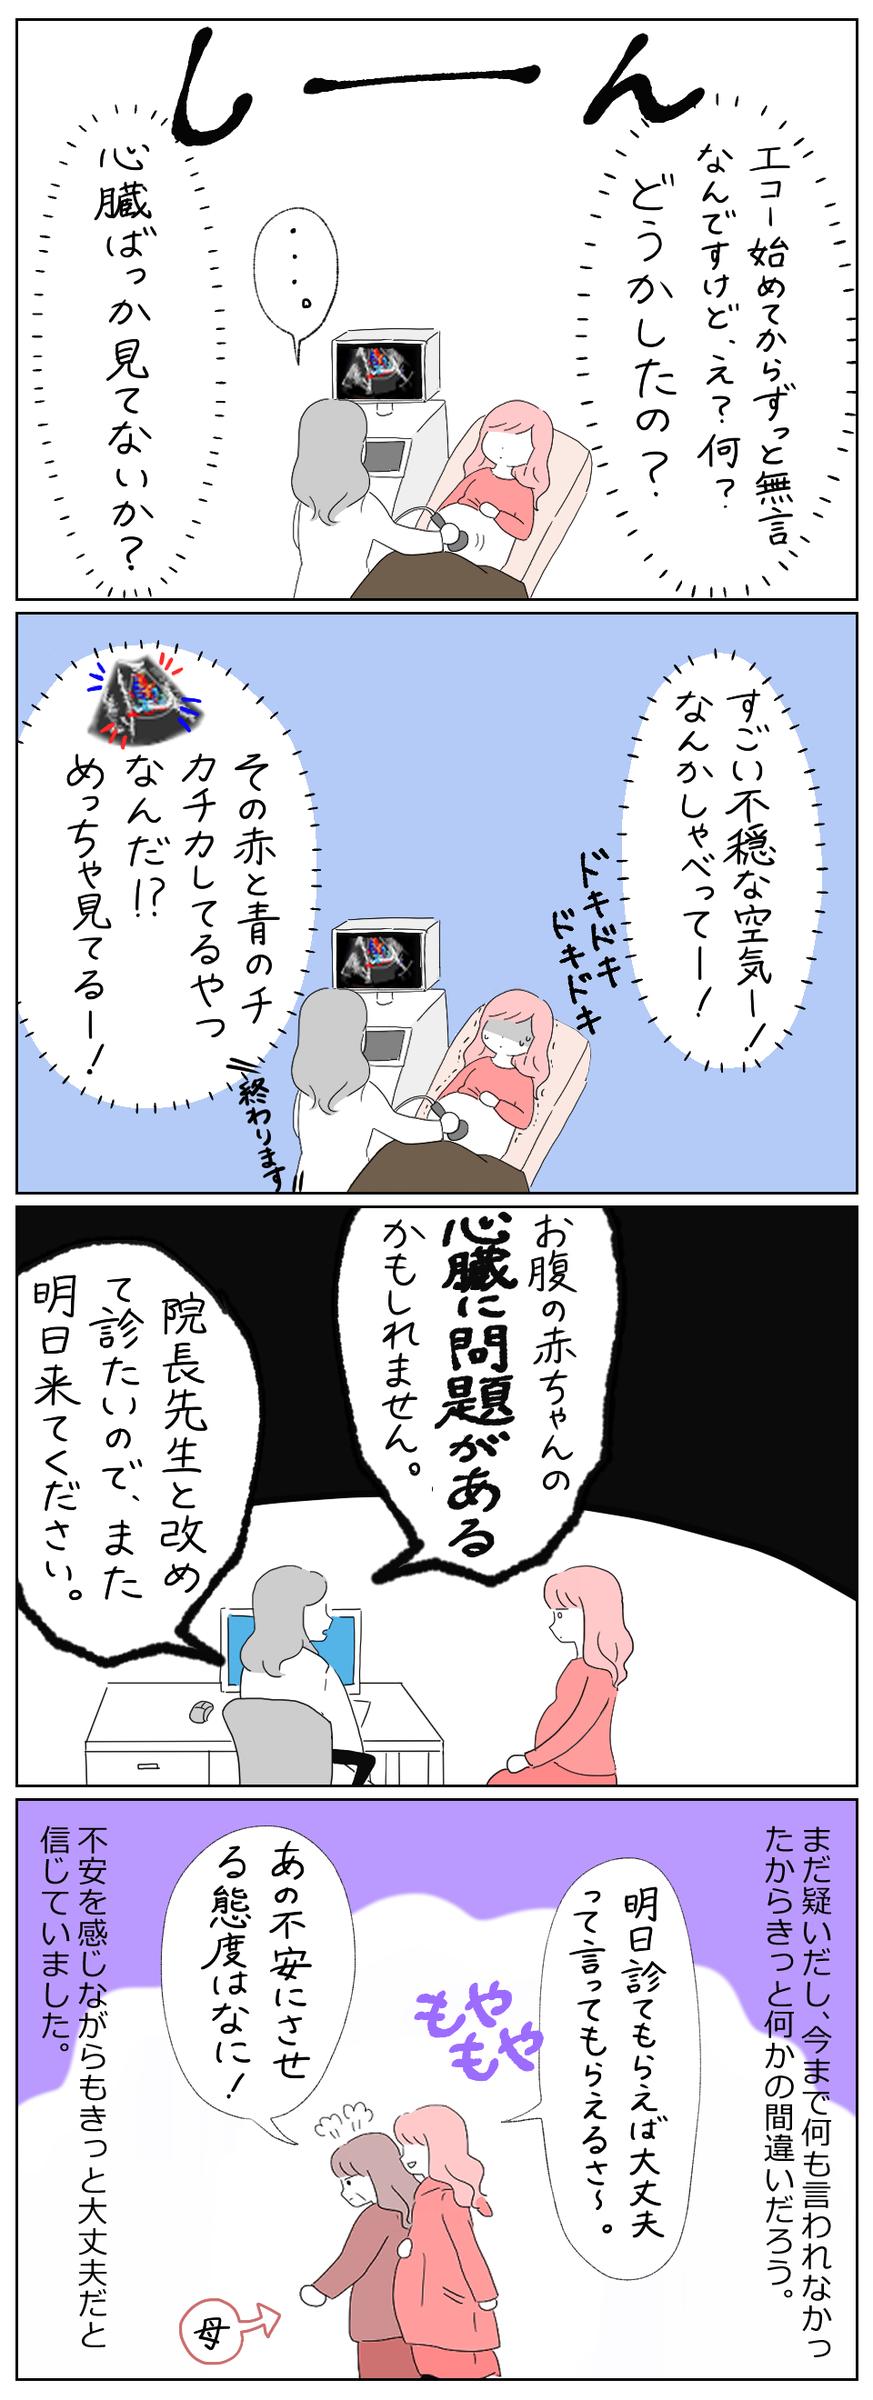 f:id:kayarimo:20190315215729j:plain